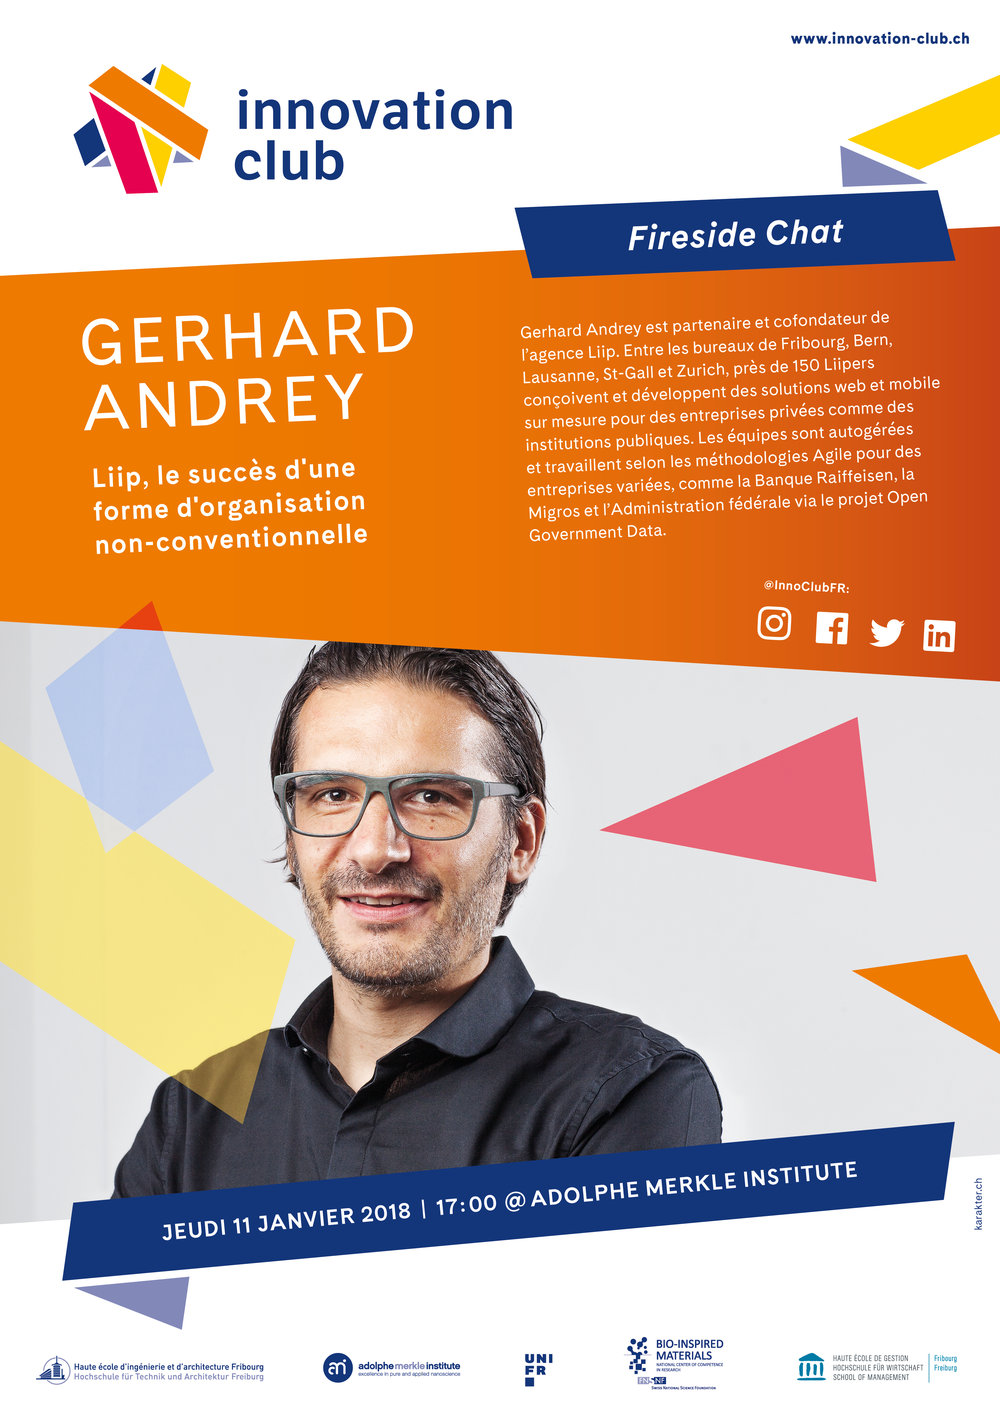 InnC_GerhardAndrey_11-01-18.jpg